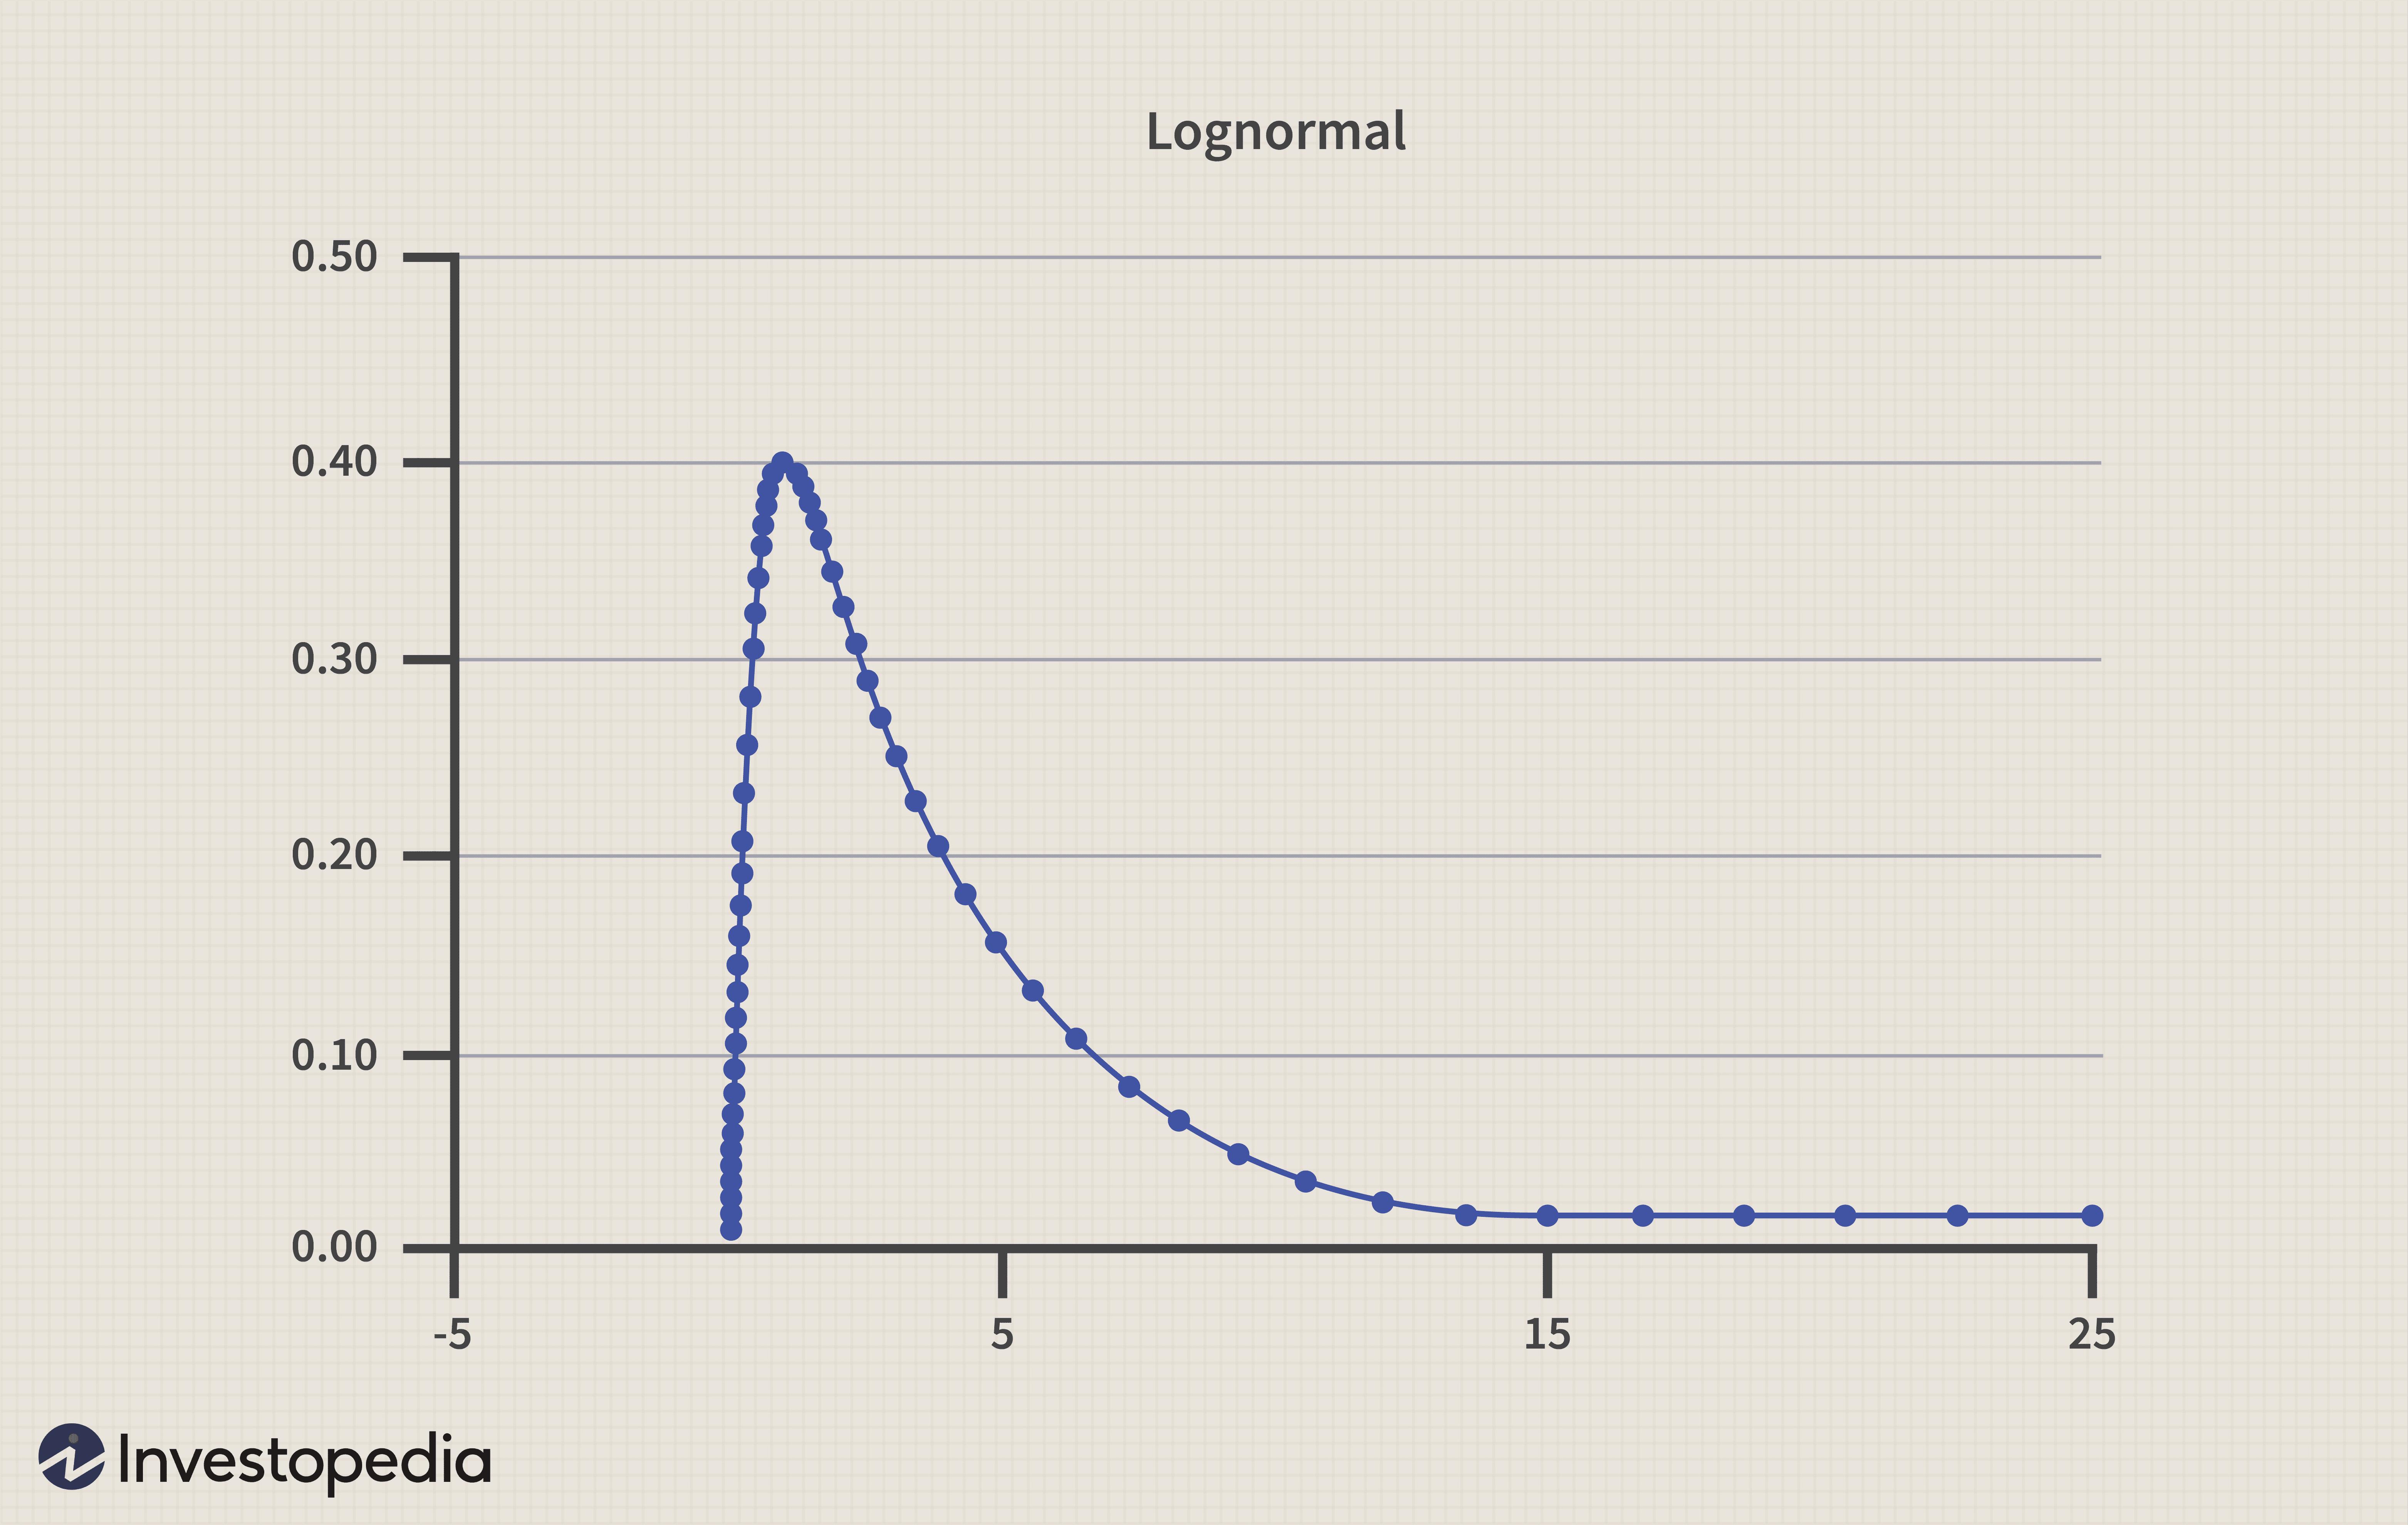 Right-skewed returns distribution